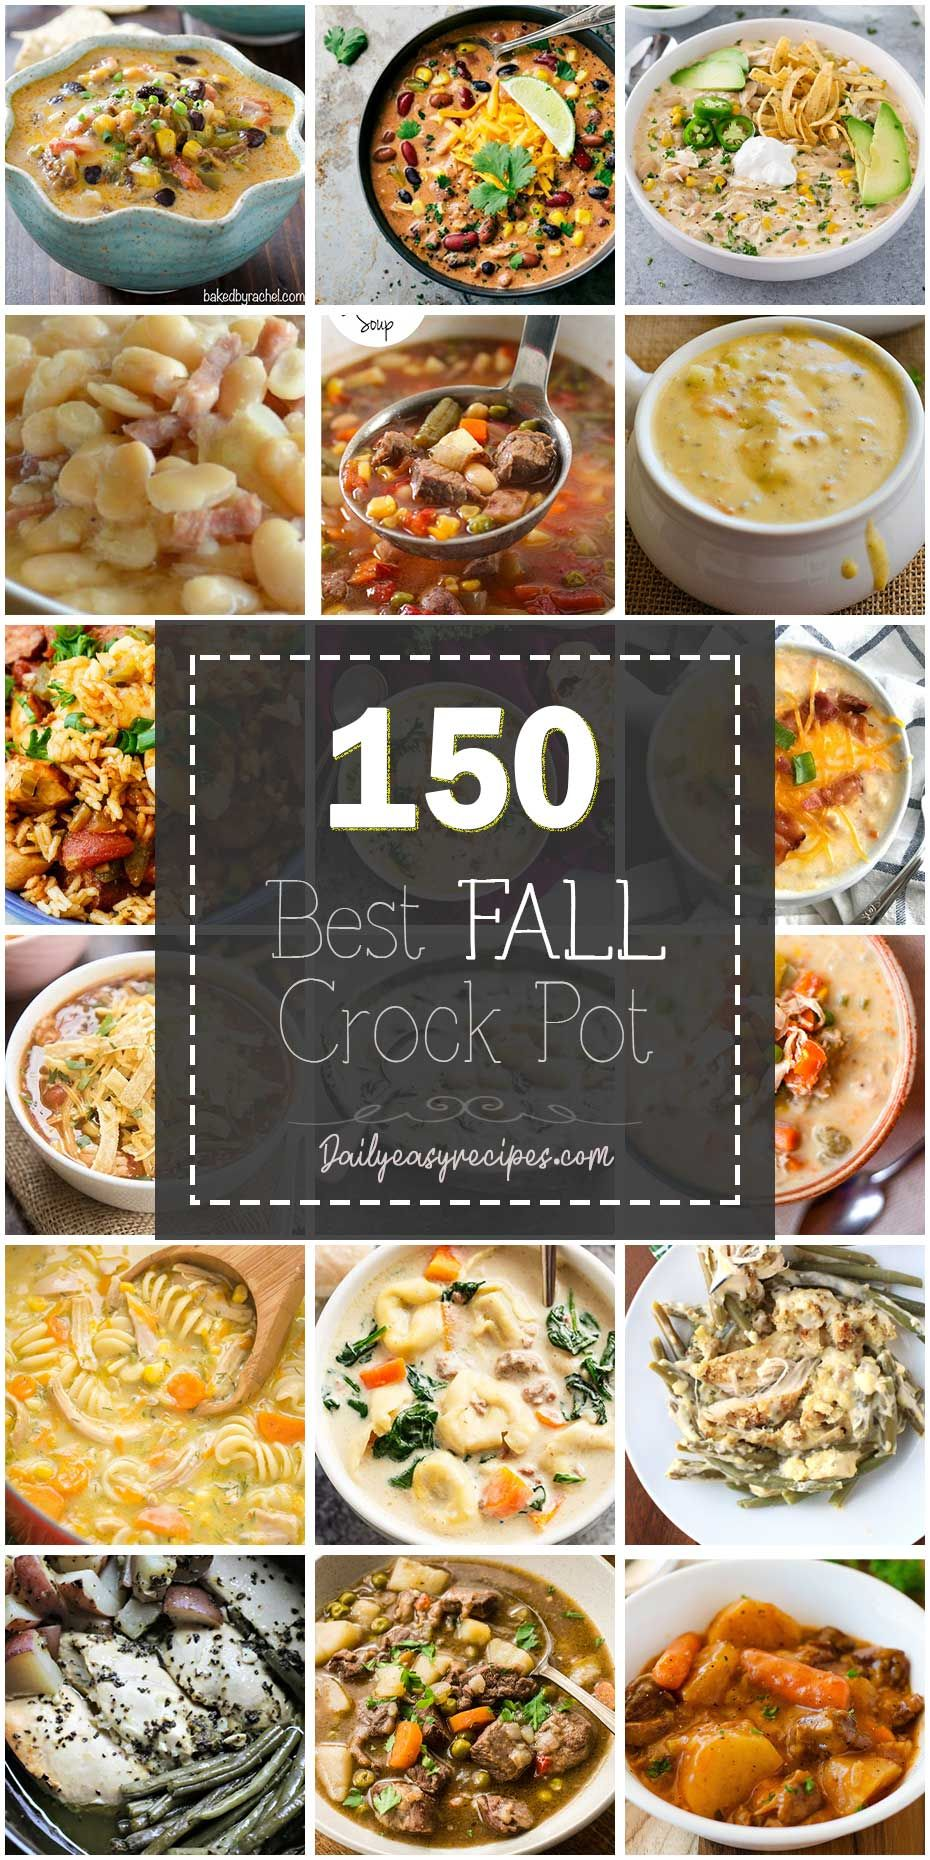 150 Best Fall Crockpot Recipes #crockpotmeals